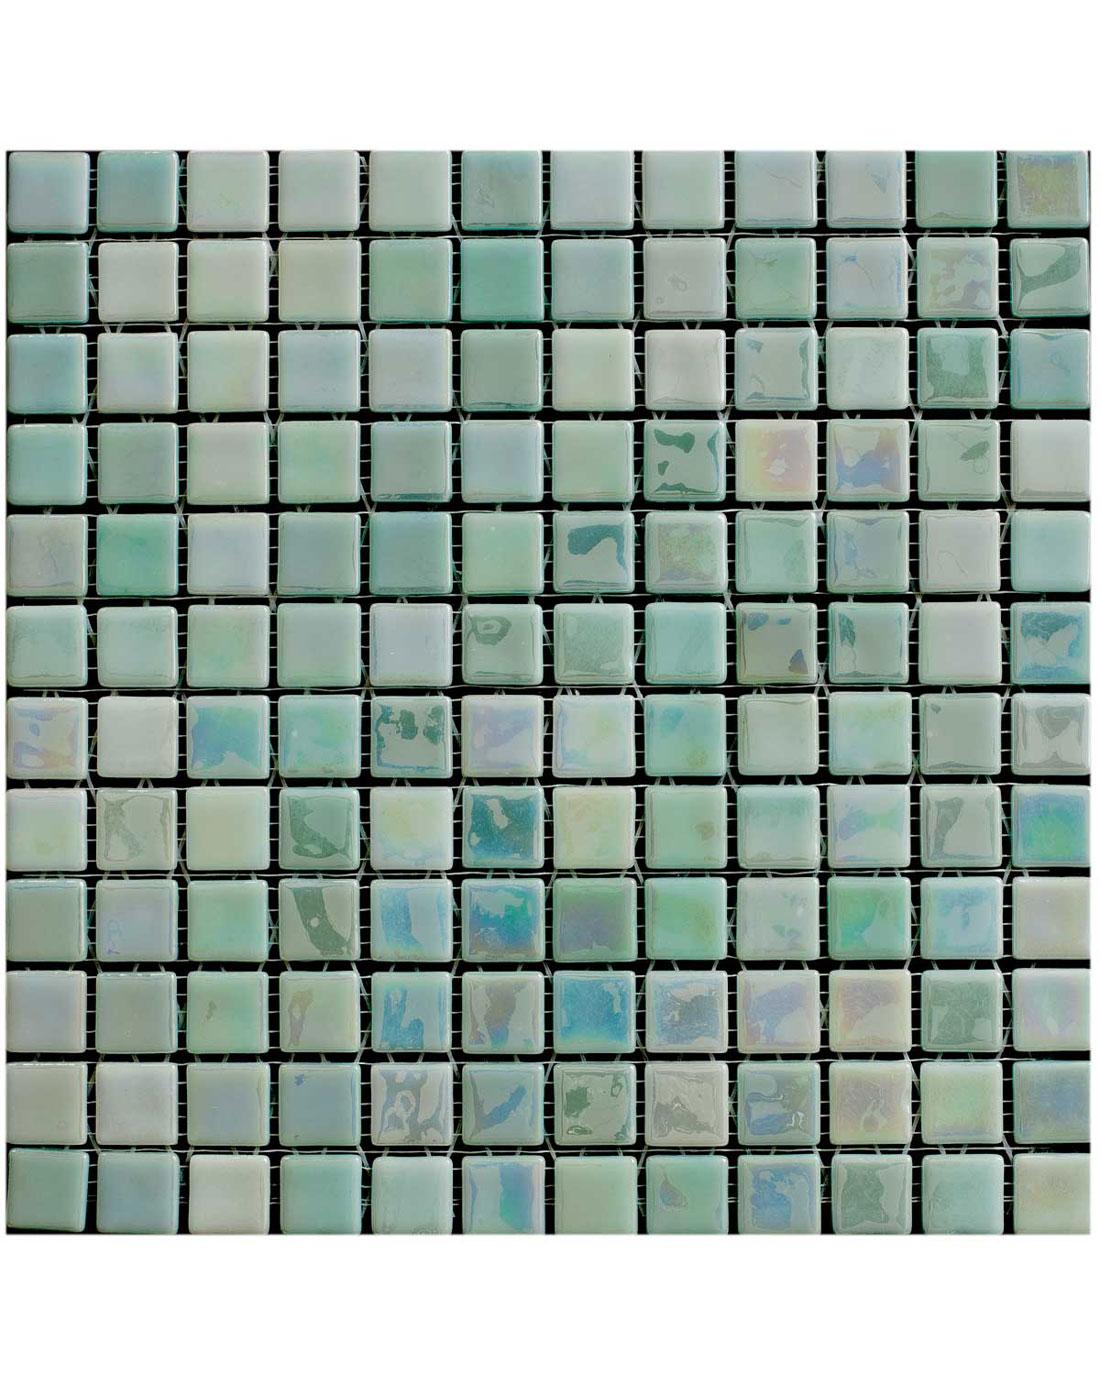 Acquaris Lotto Mosaic Wall Tiles - Kitchen Tiles Direct